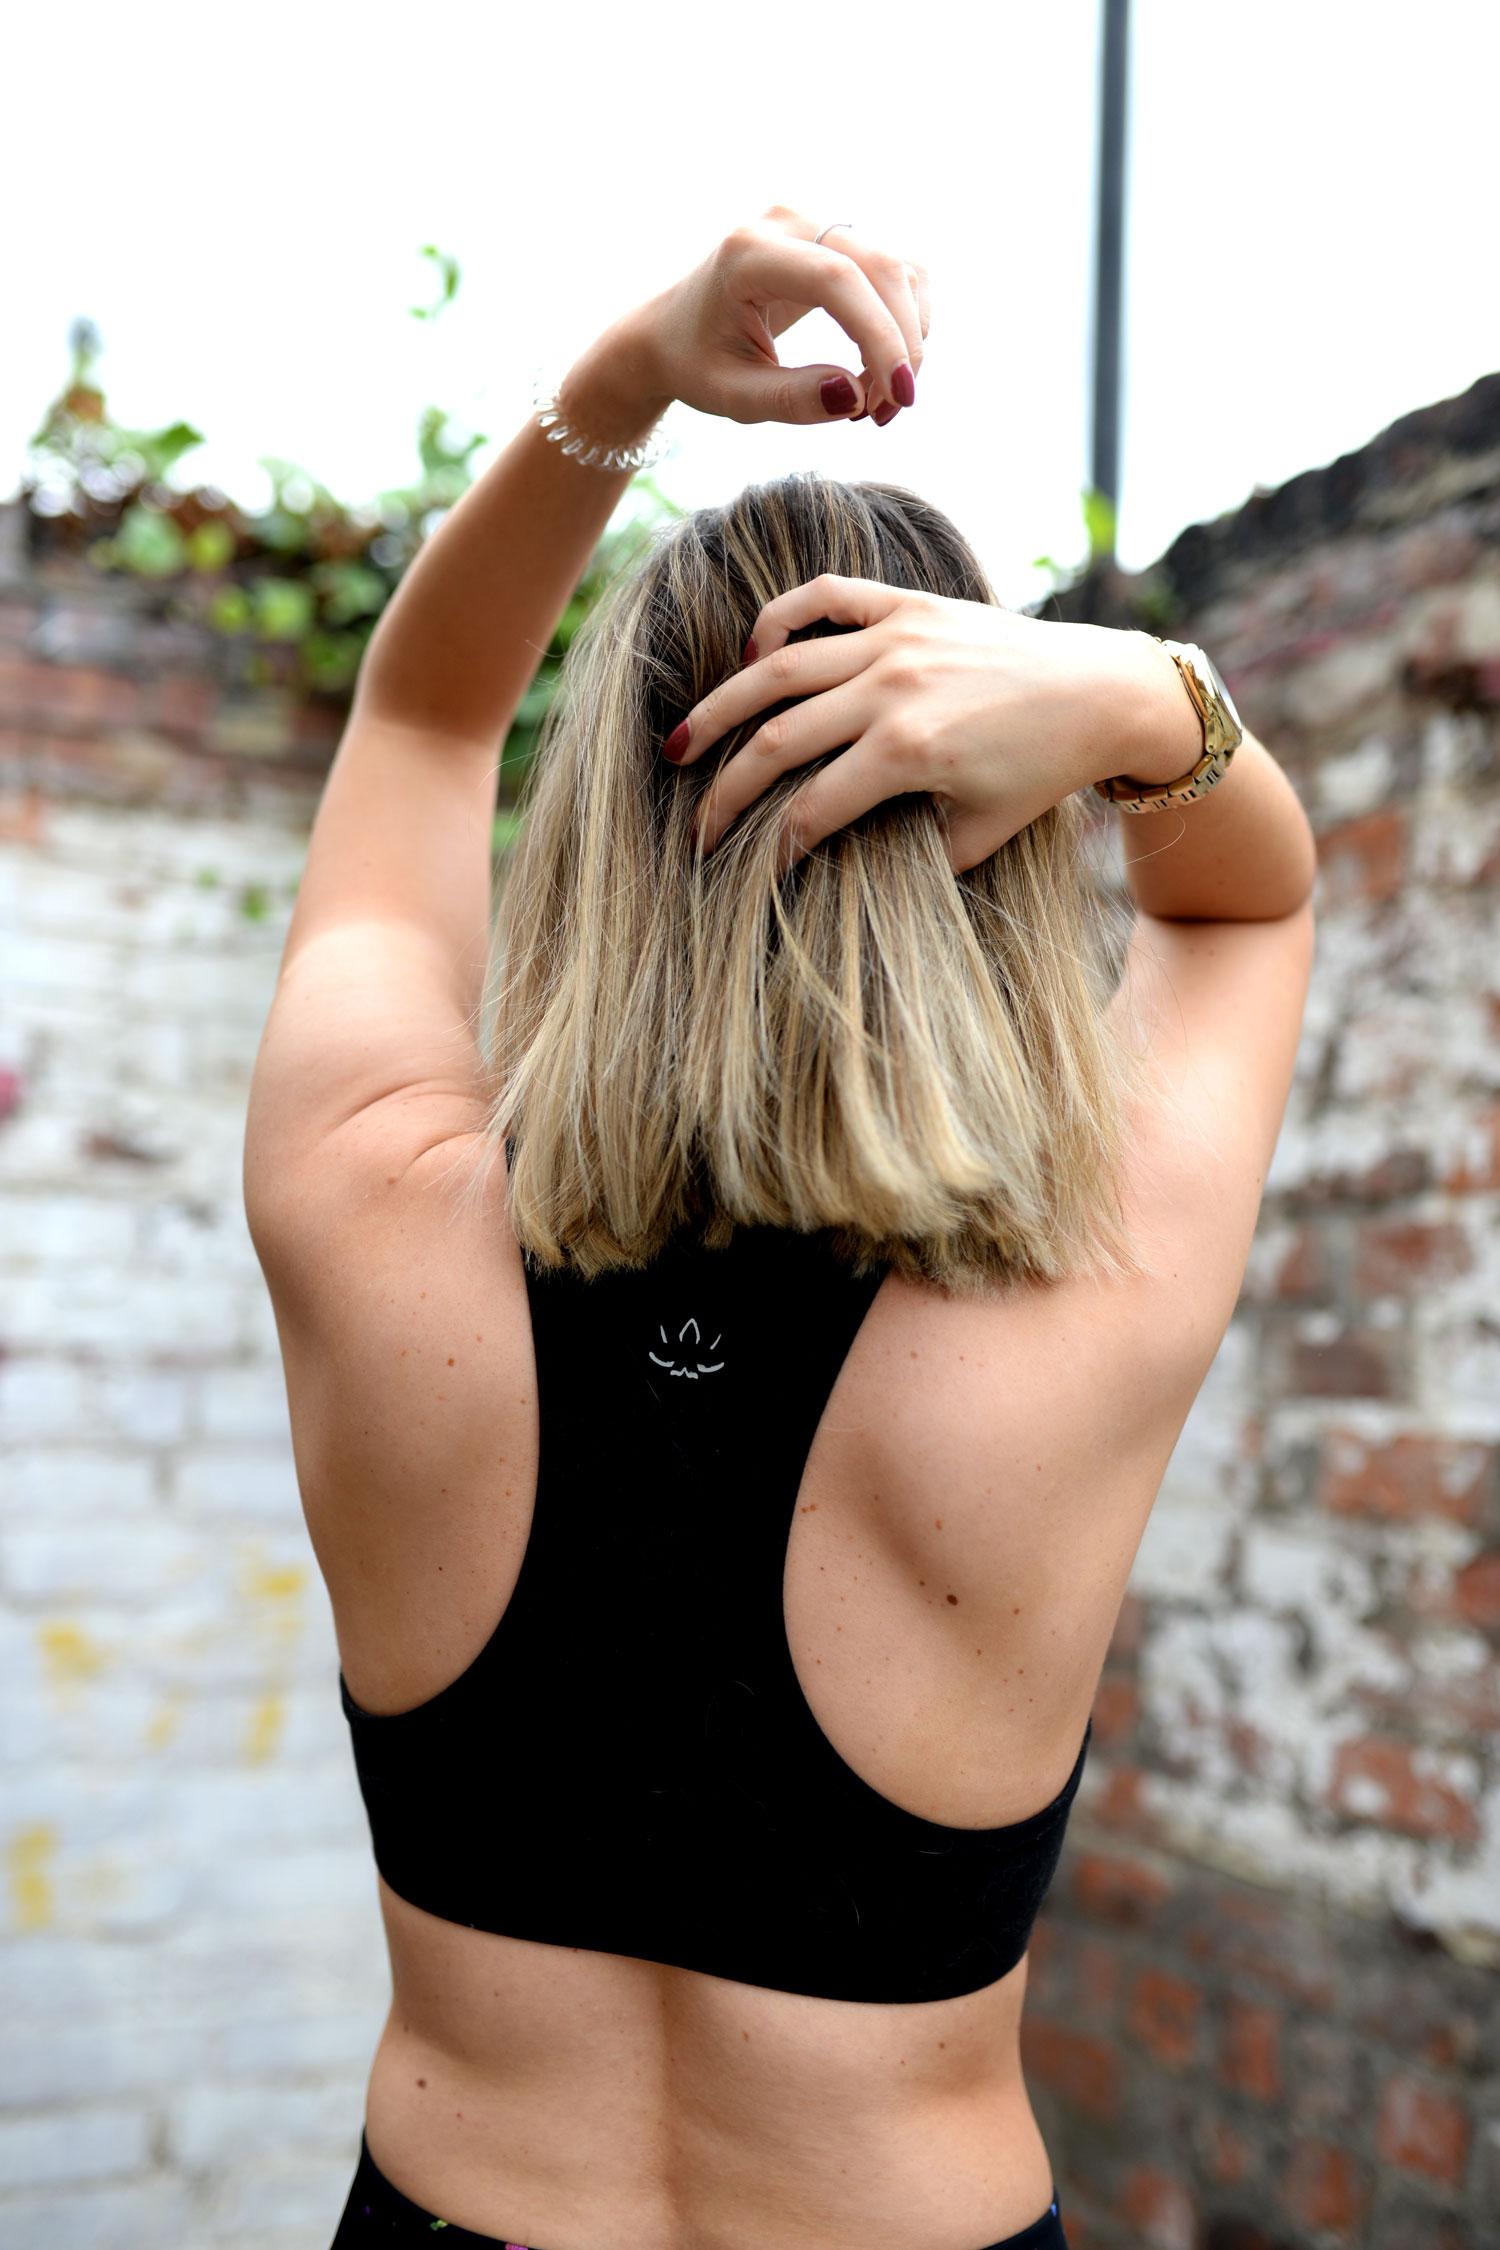 the-sports-edit-leggings-sports-bra-yoga-outfit-12